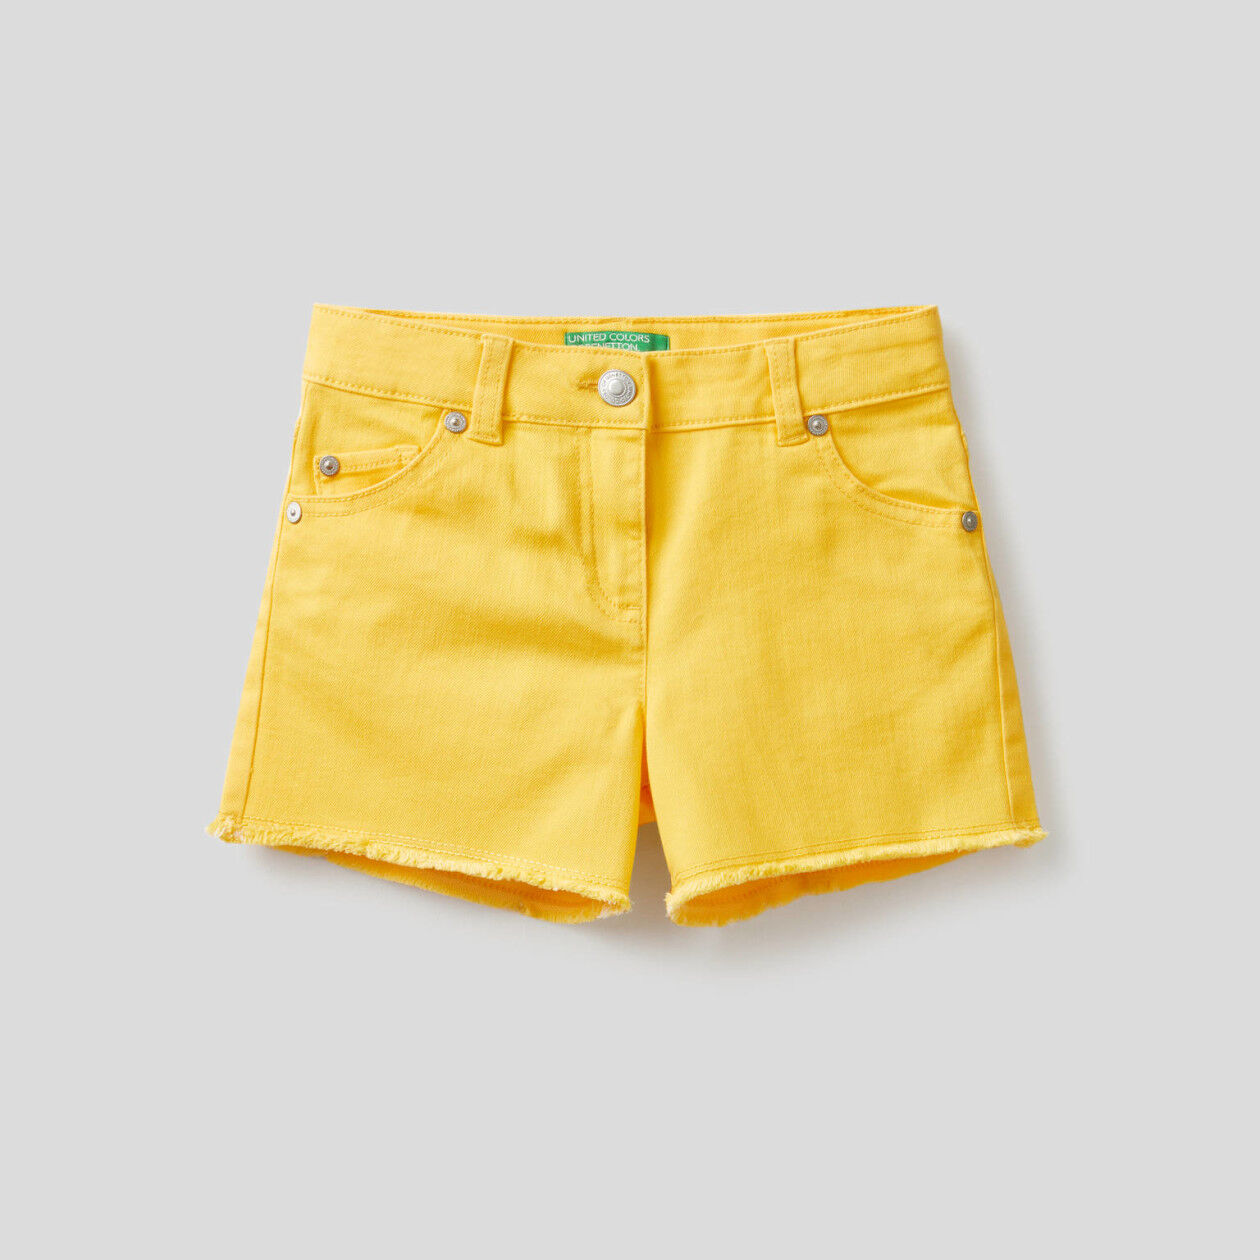 Pantalón corto de algodón elástico mixto